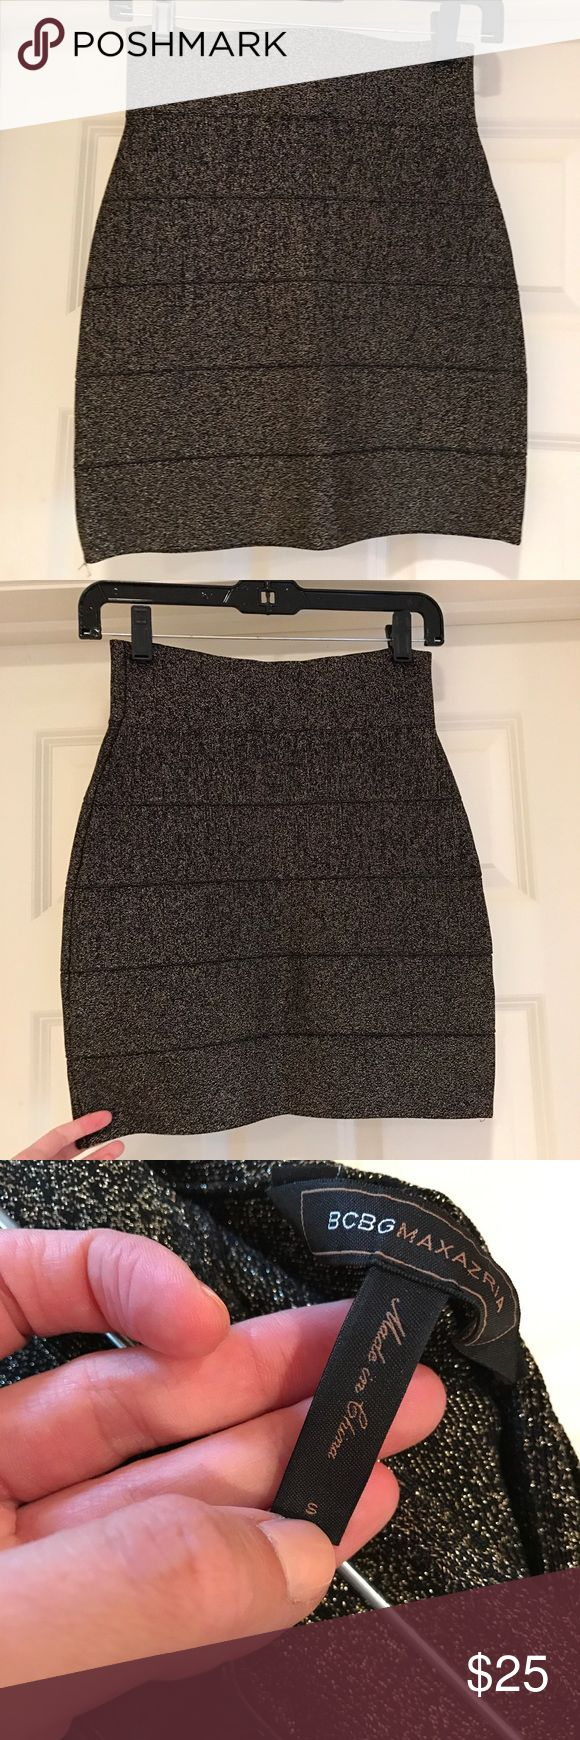 BCBG Metallic Skirt BCBG Metallic Skirt. Worn 2 times, excellent condition. BCBGMaxAzria Skirts Pencil